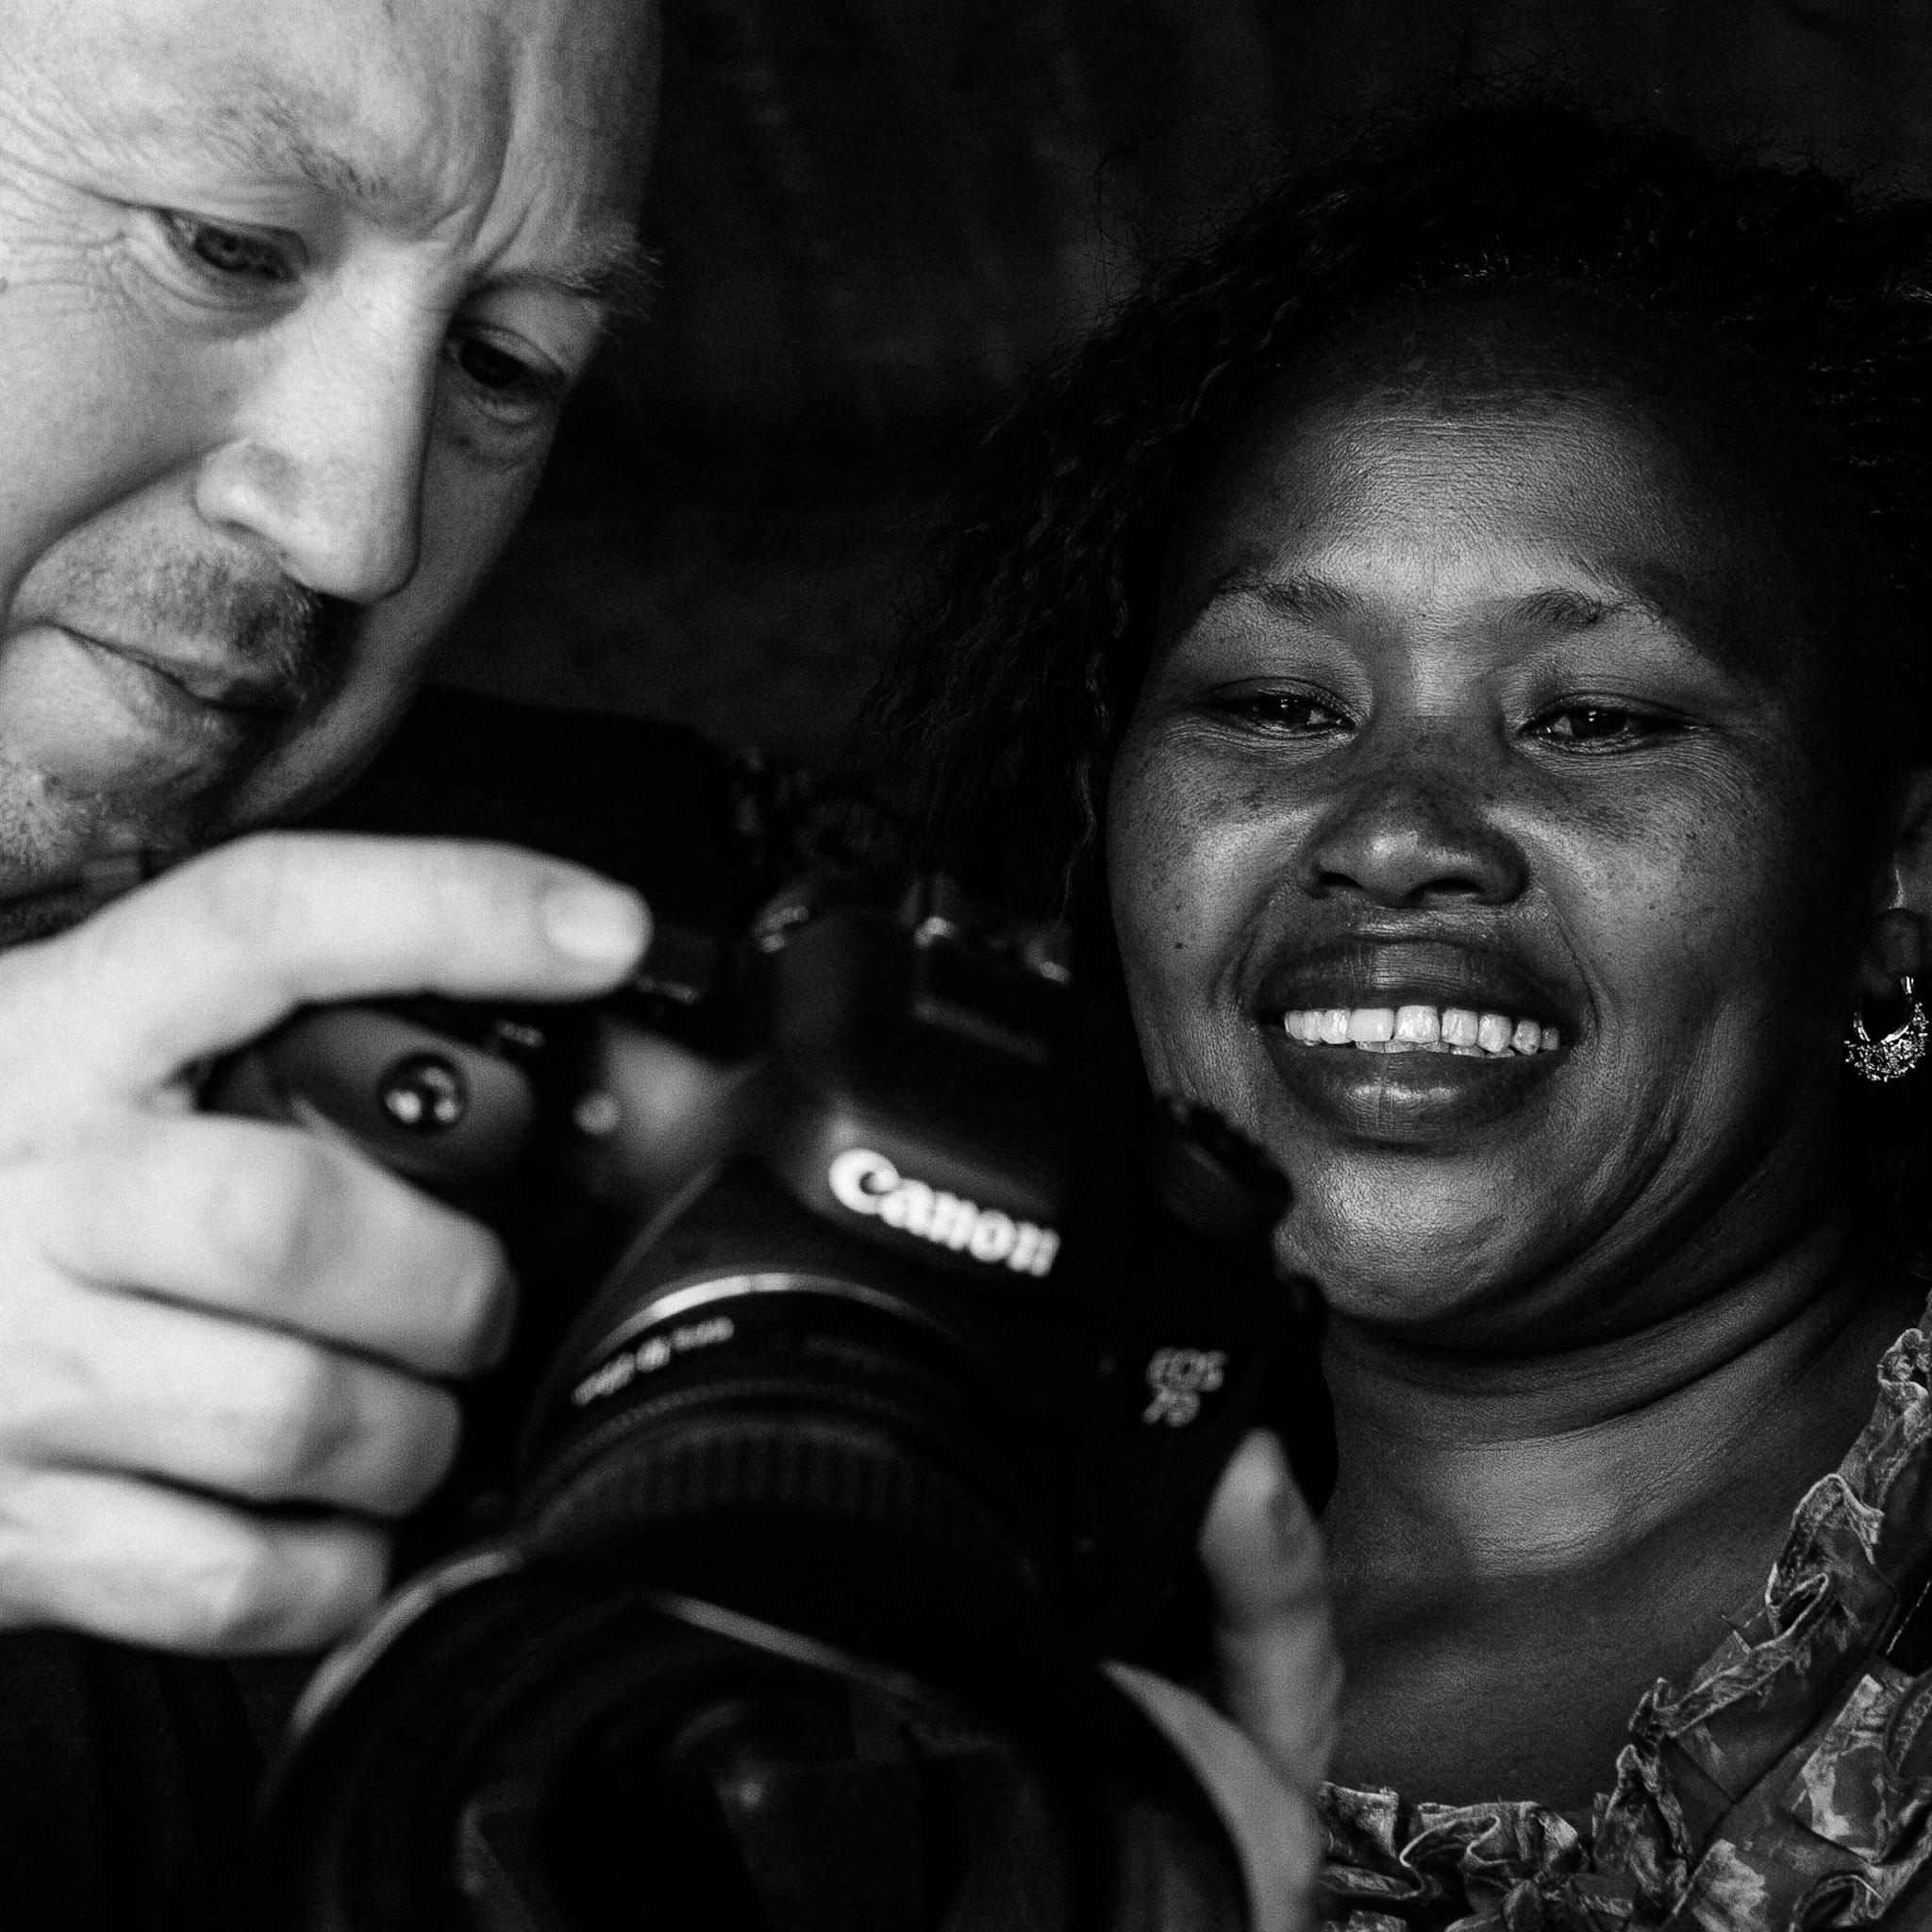 Adam Dickens Photography 2015 - Five Talents UK, Kenya - Me 6.jpg